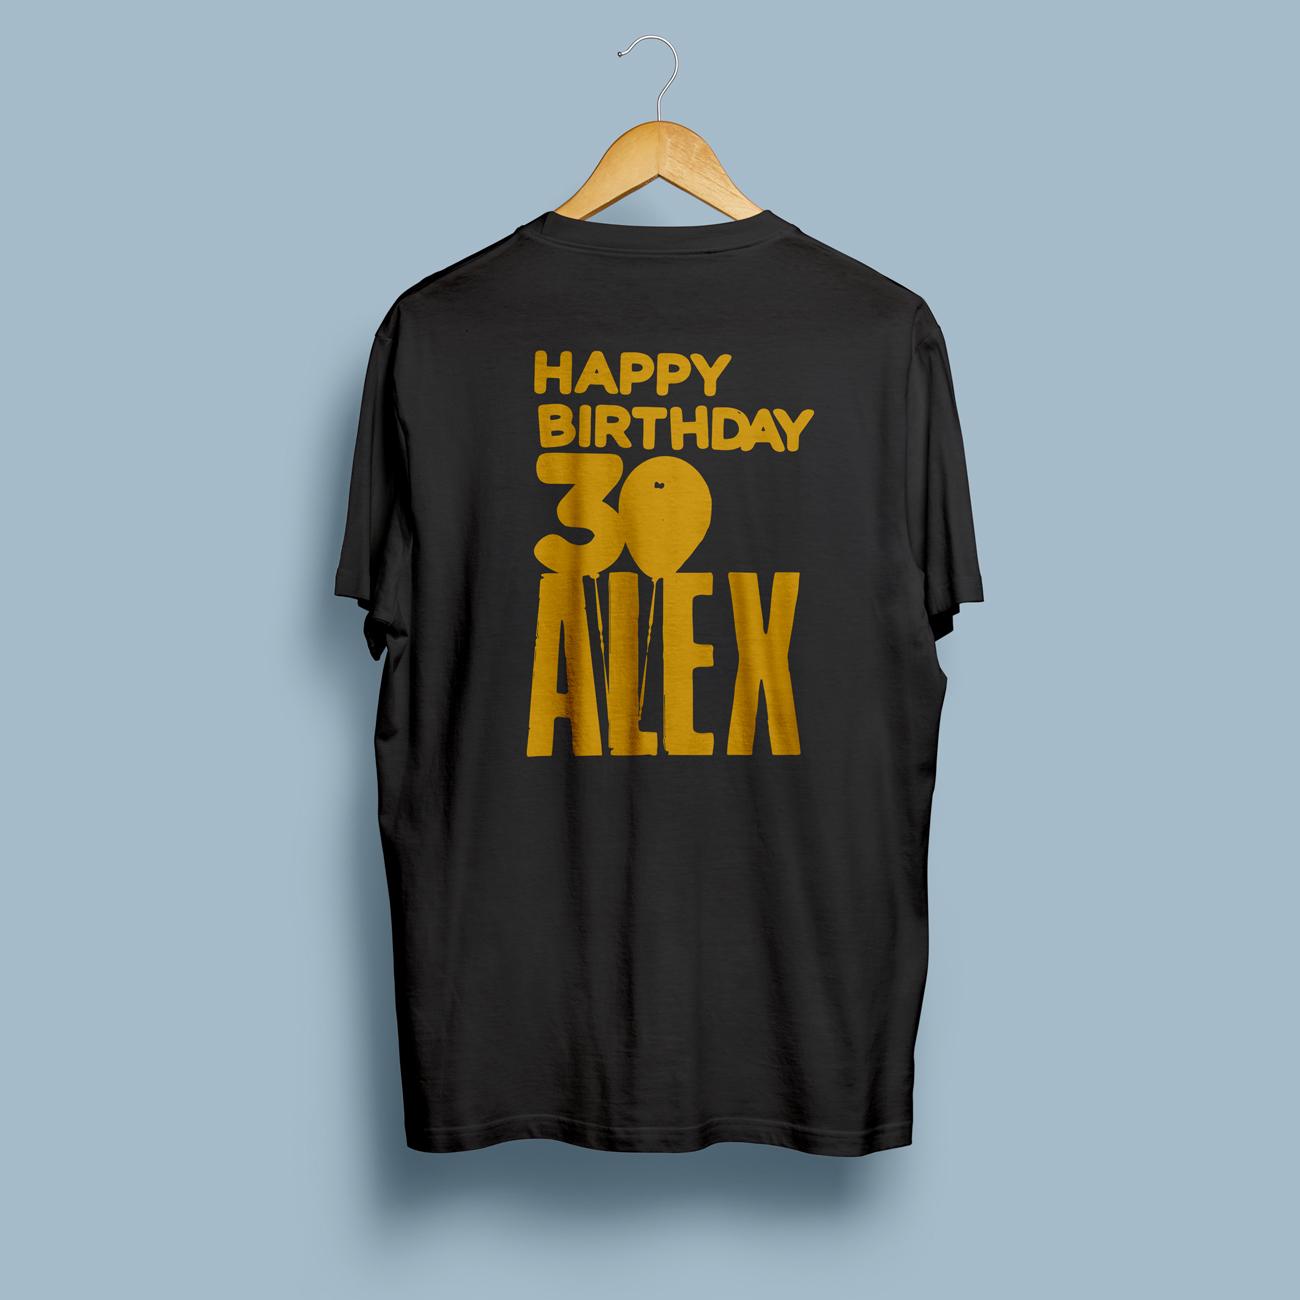 Birthday Shirt schwarz